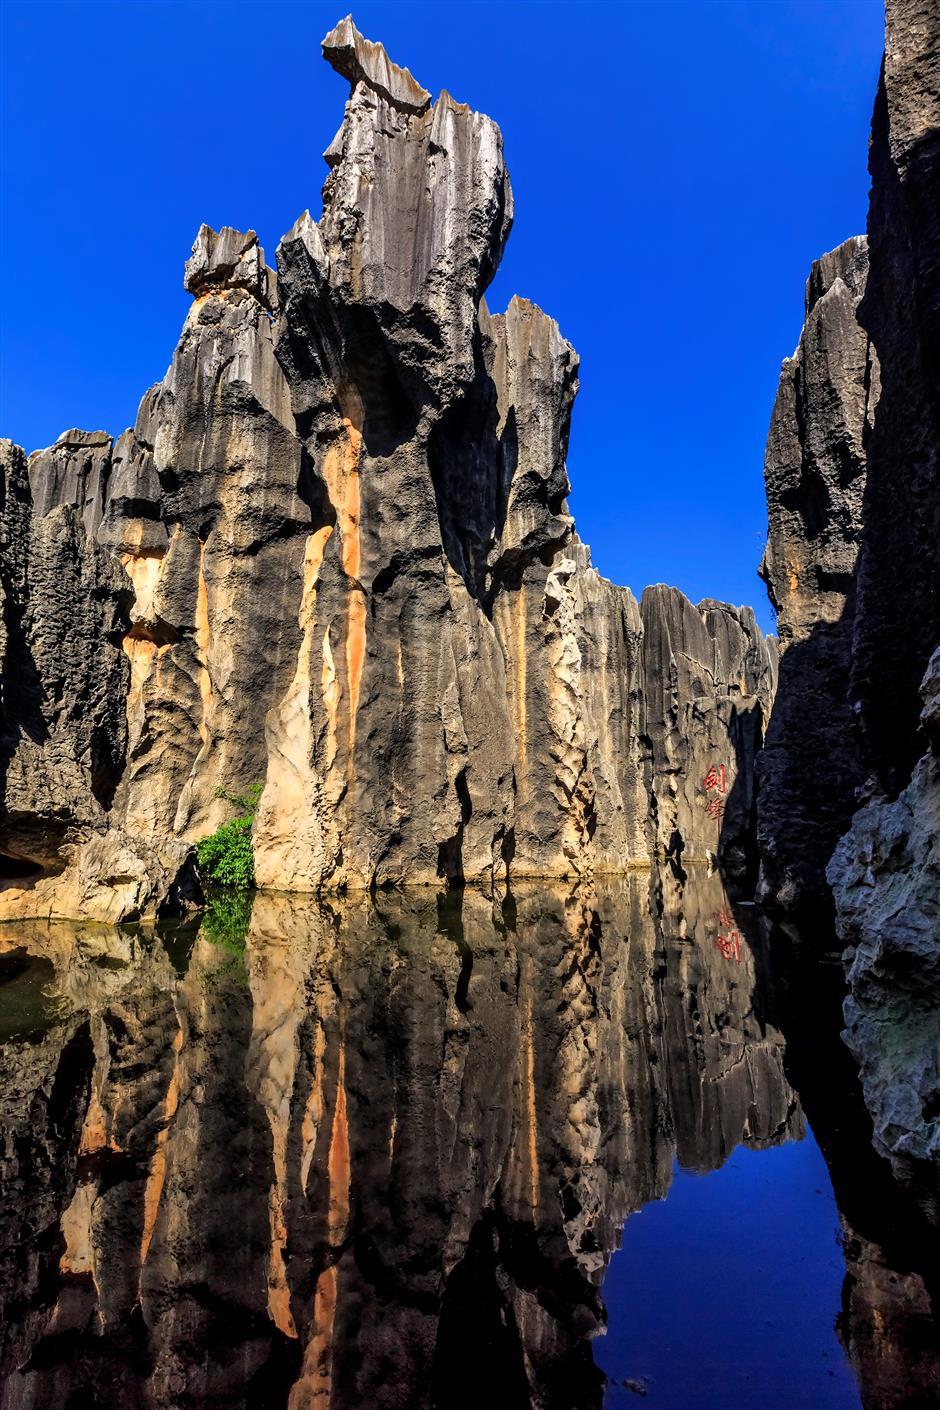 Stone Forest amazes visitors, inspires old legends